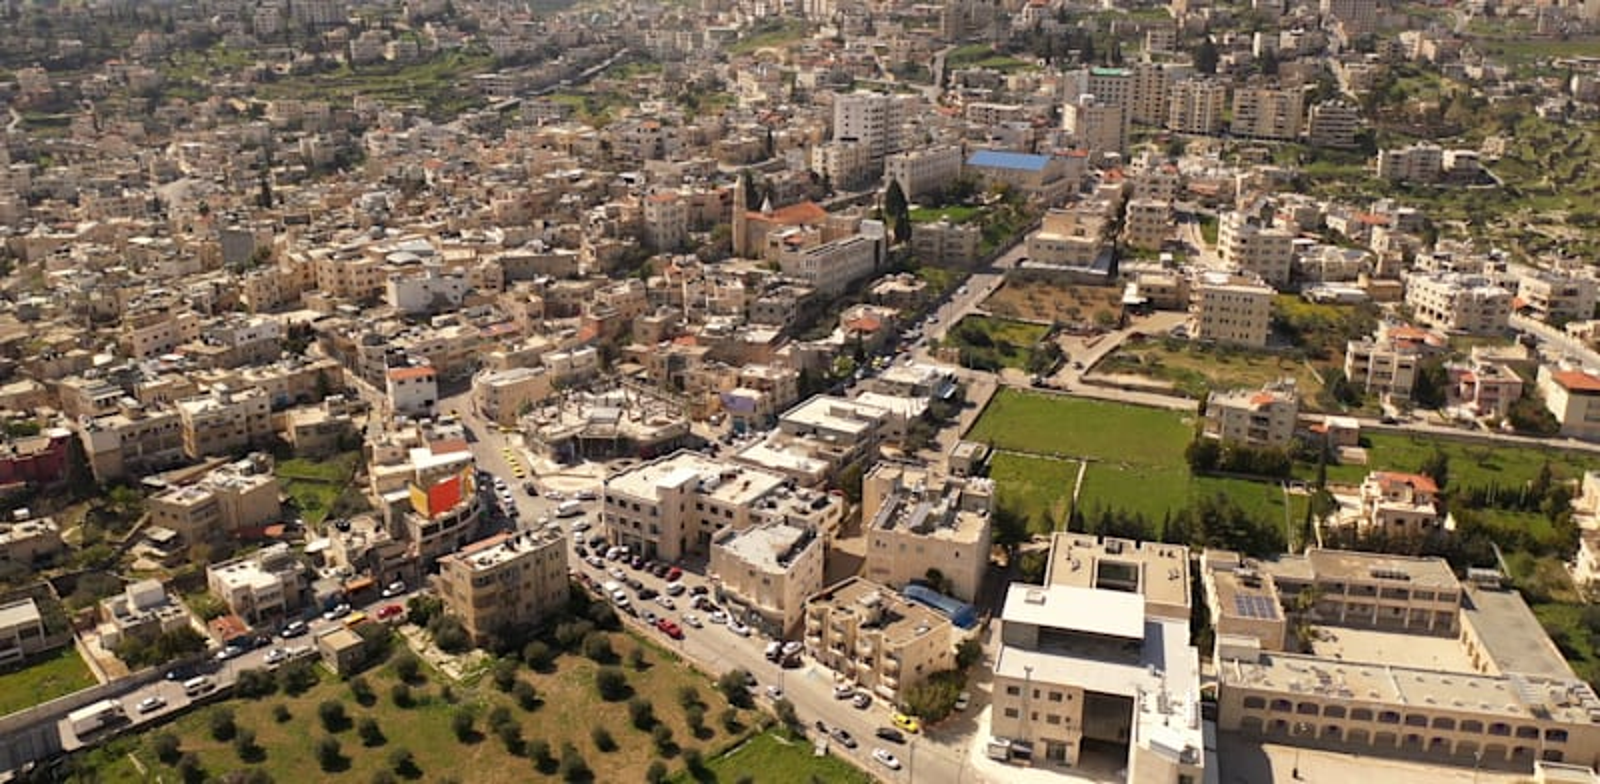 Bethlehem Photo: Shutterstock ImageBank4u